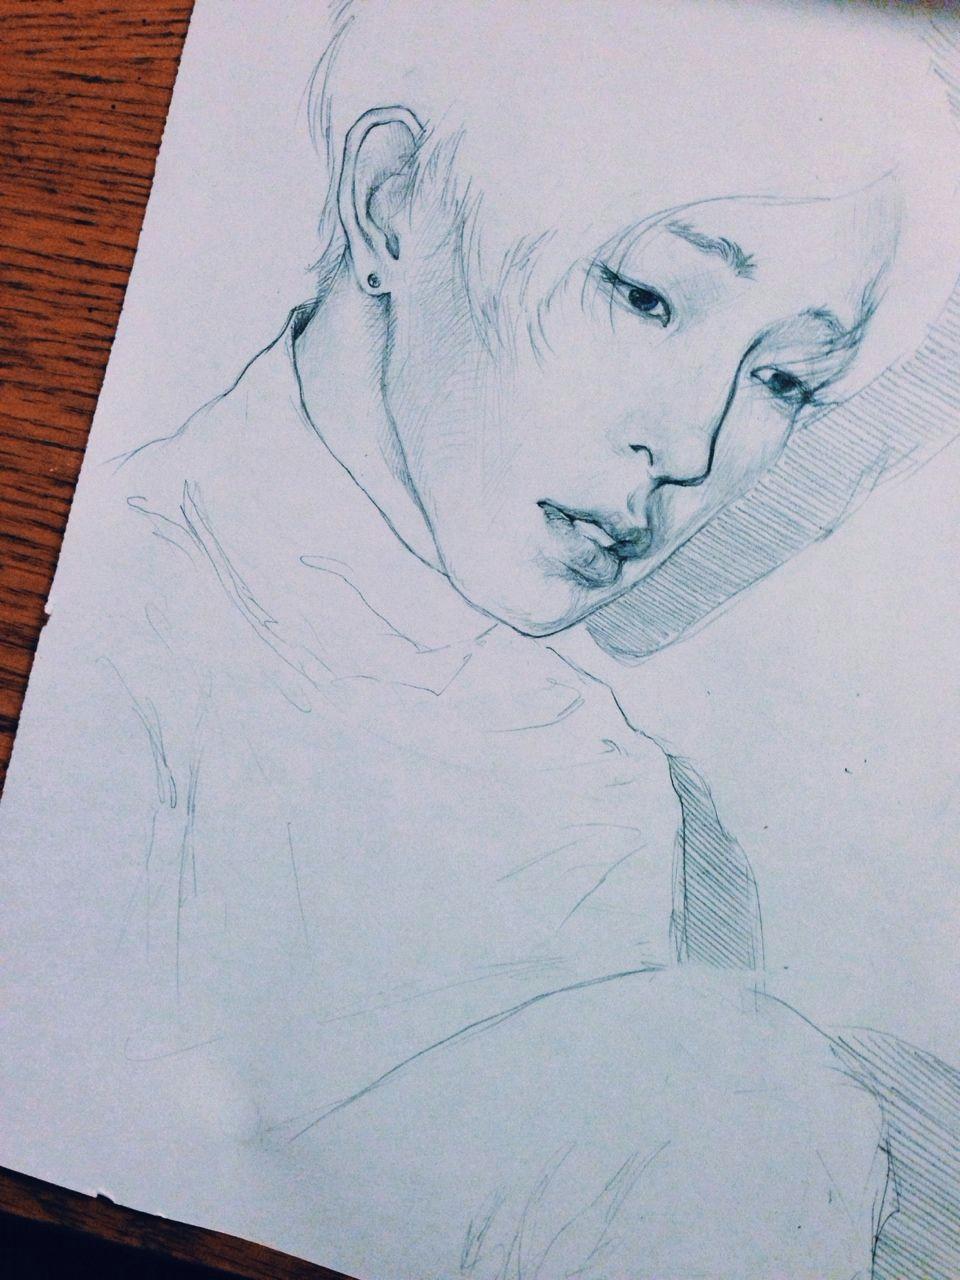 Tumblr Drawing Kpop Nam Taehyun Tumblr Art Pinterest Fan Art Kpop Fanart and